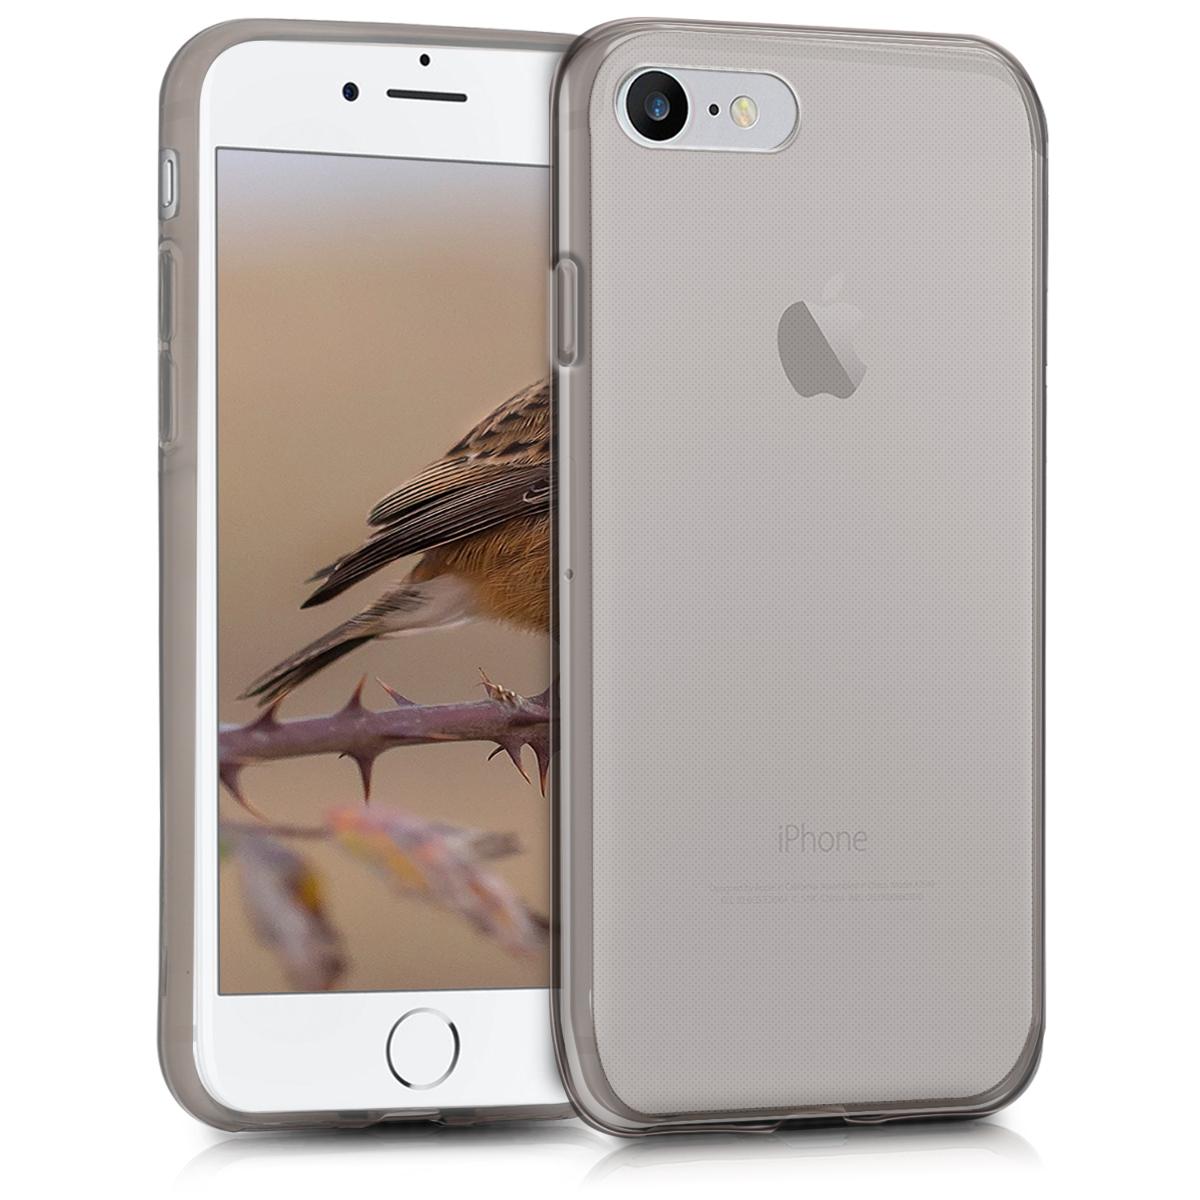 Kvalitní silikonové TPU pouzdro pro Apple iPhone 7 / 8 / SE  - Black | Transparent